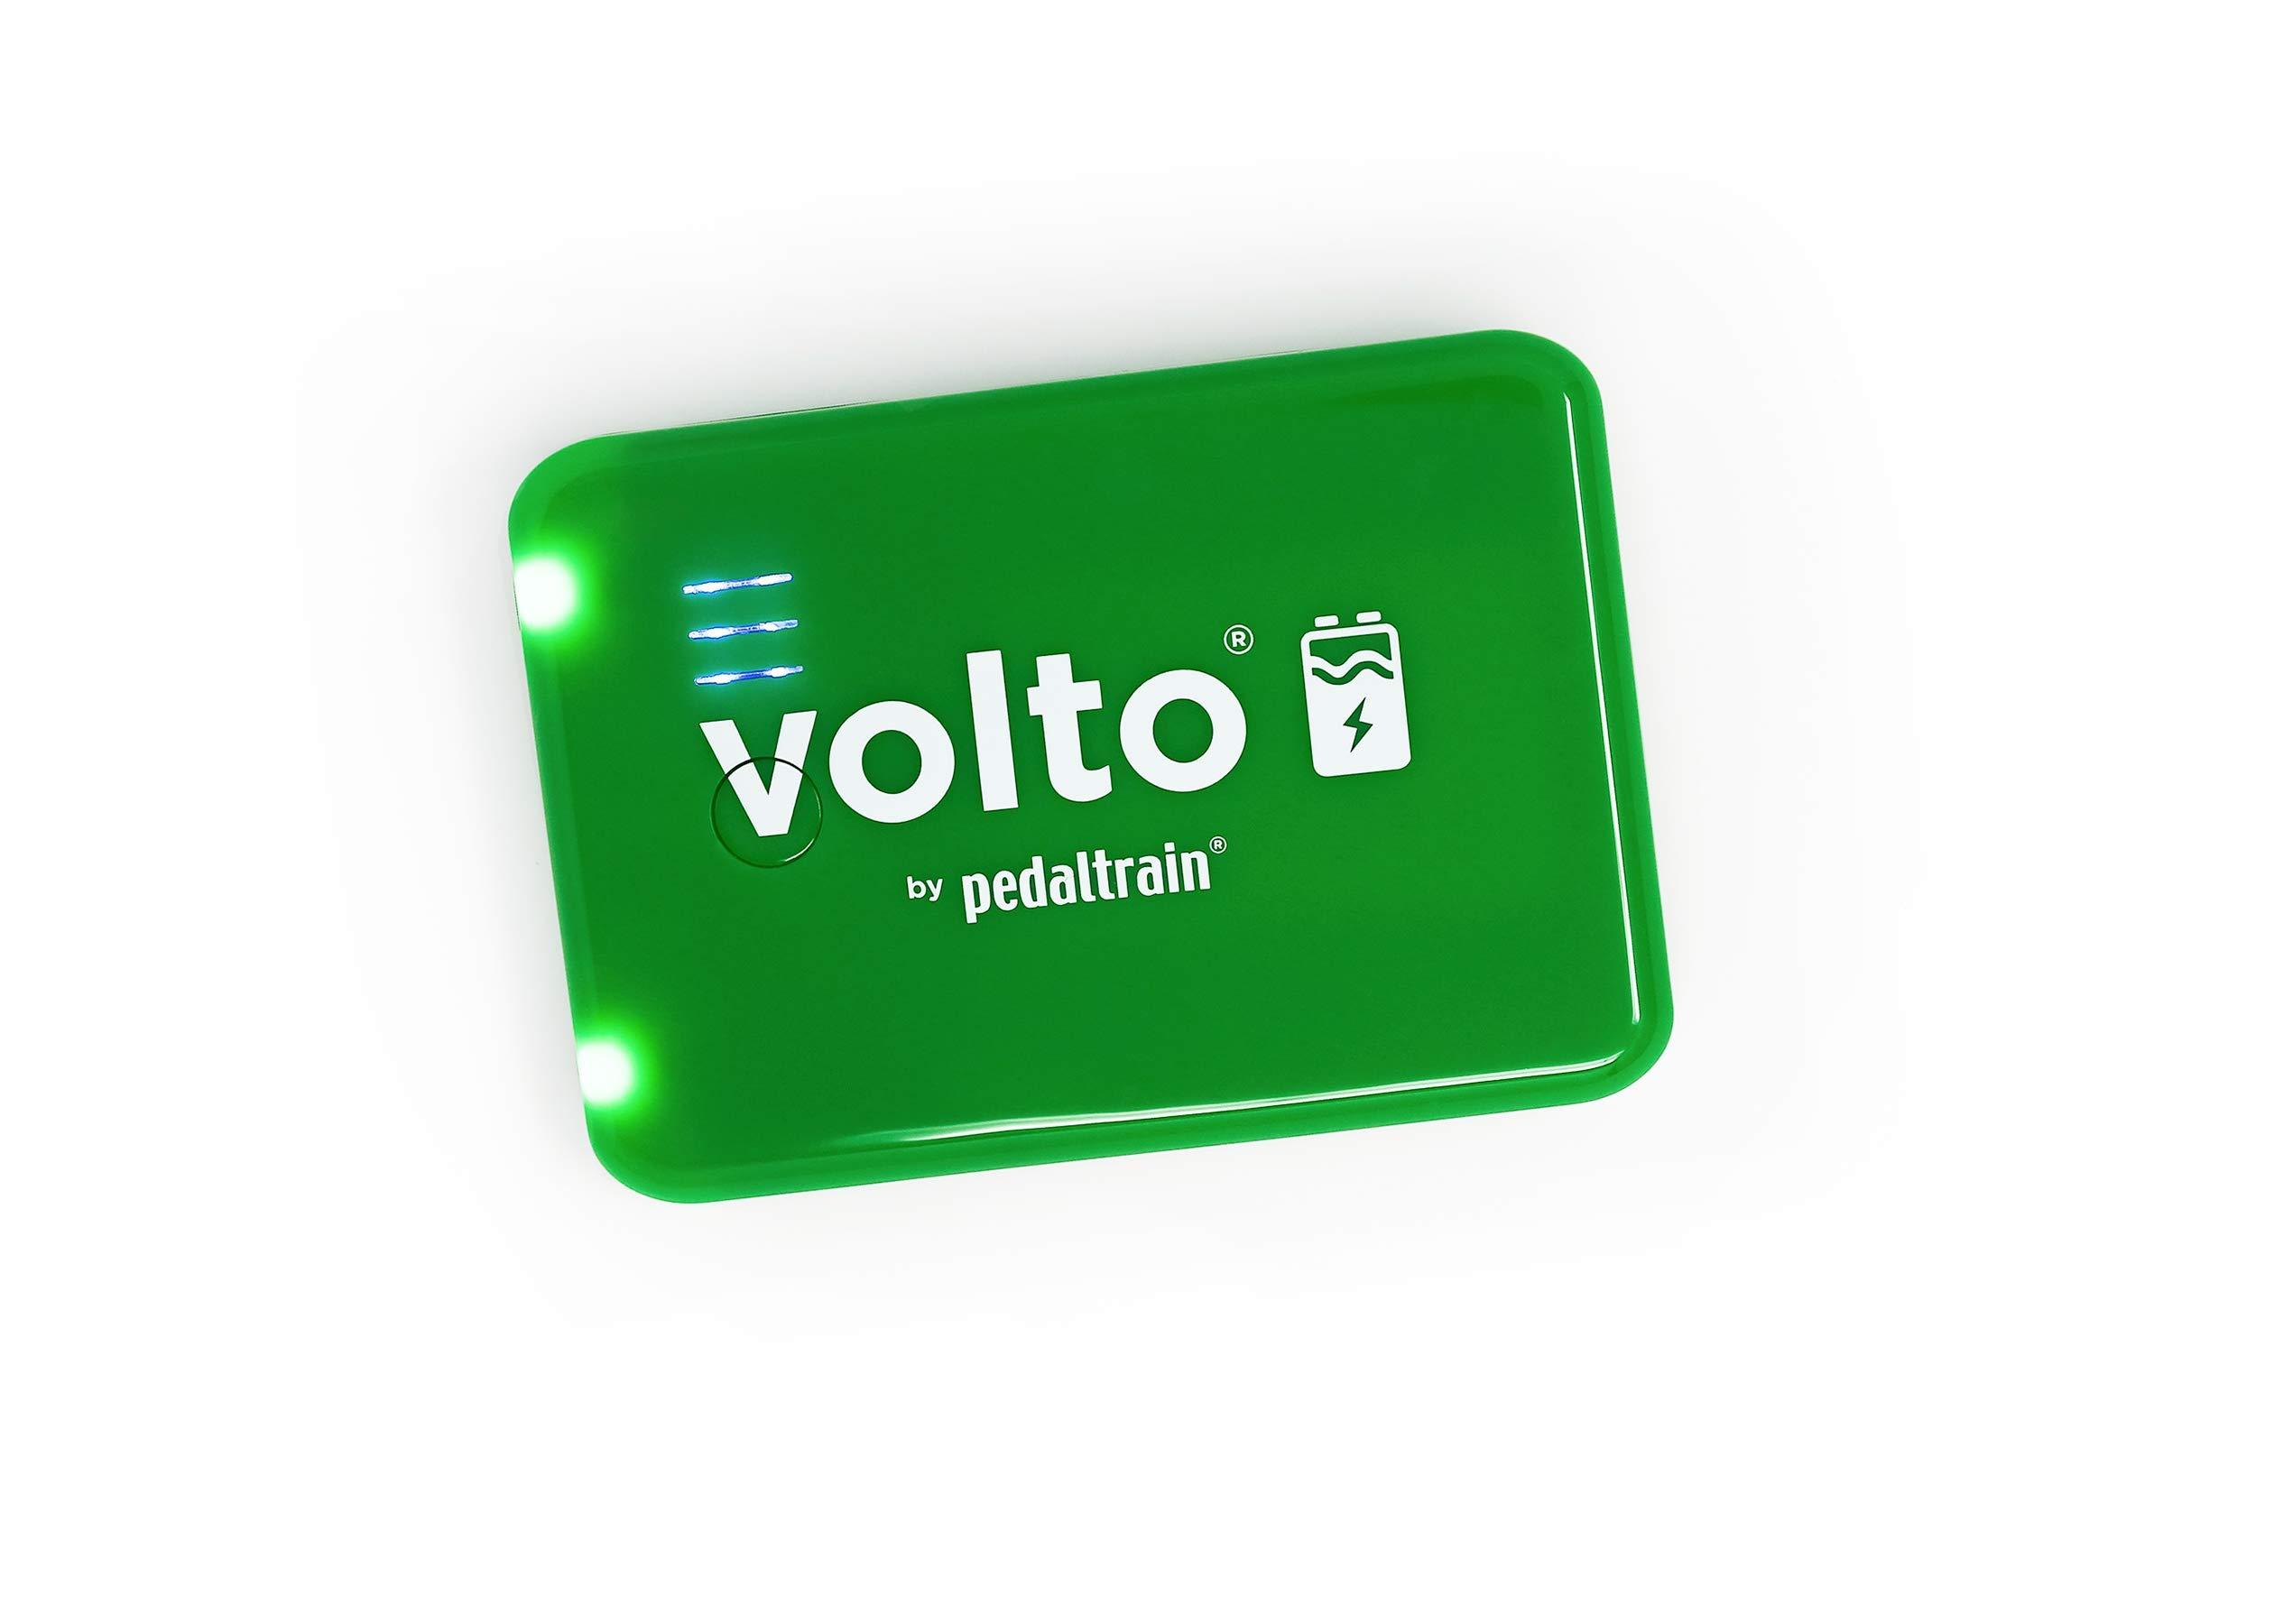 Pedaltrain Volto 3 Rechargeable Power Supply (PT-VT3 by Pedaltrain